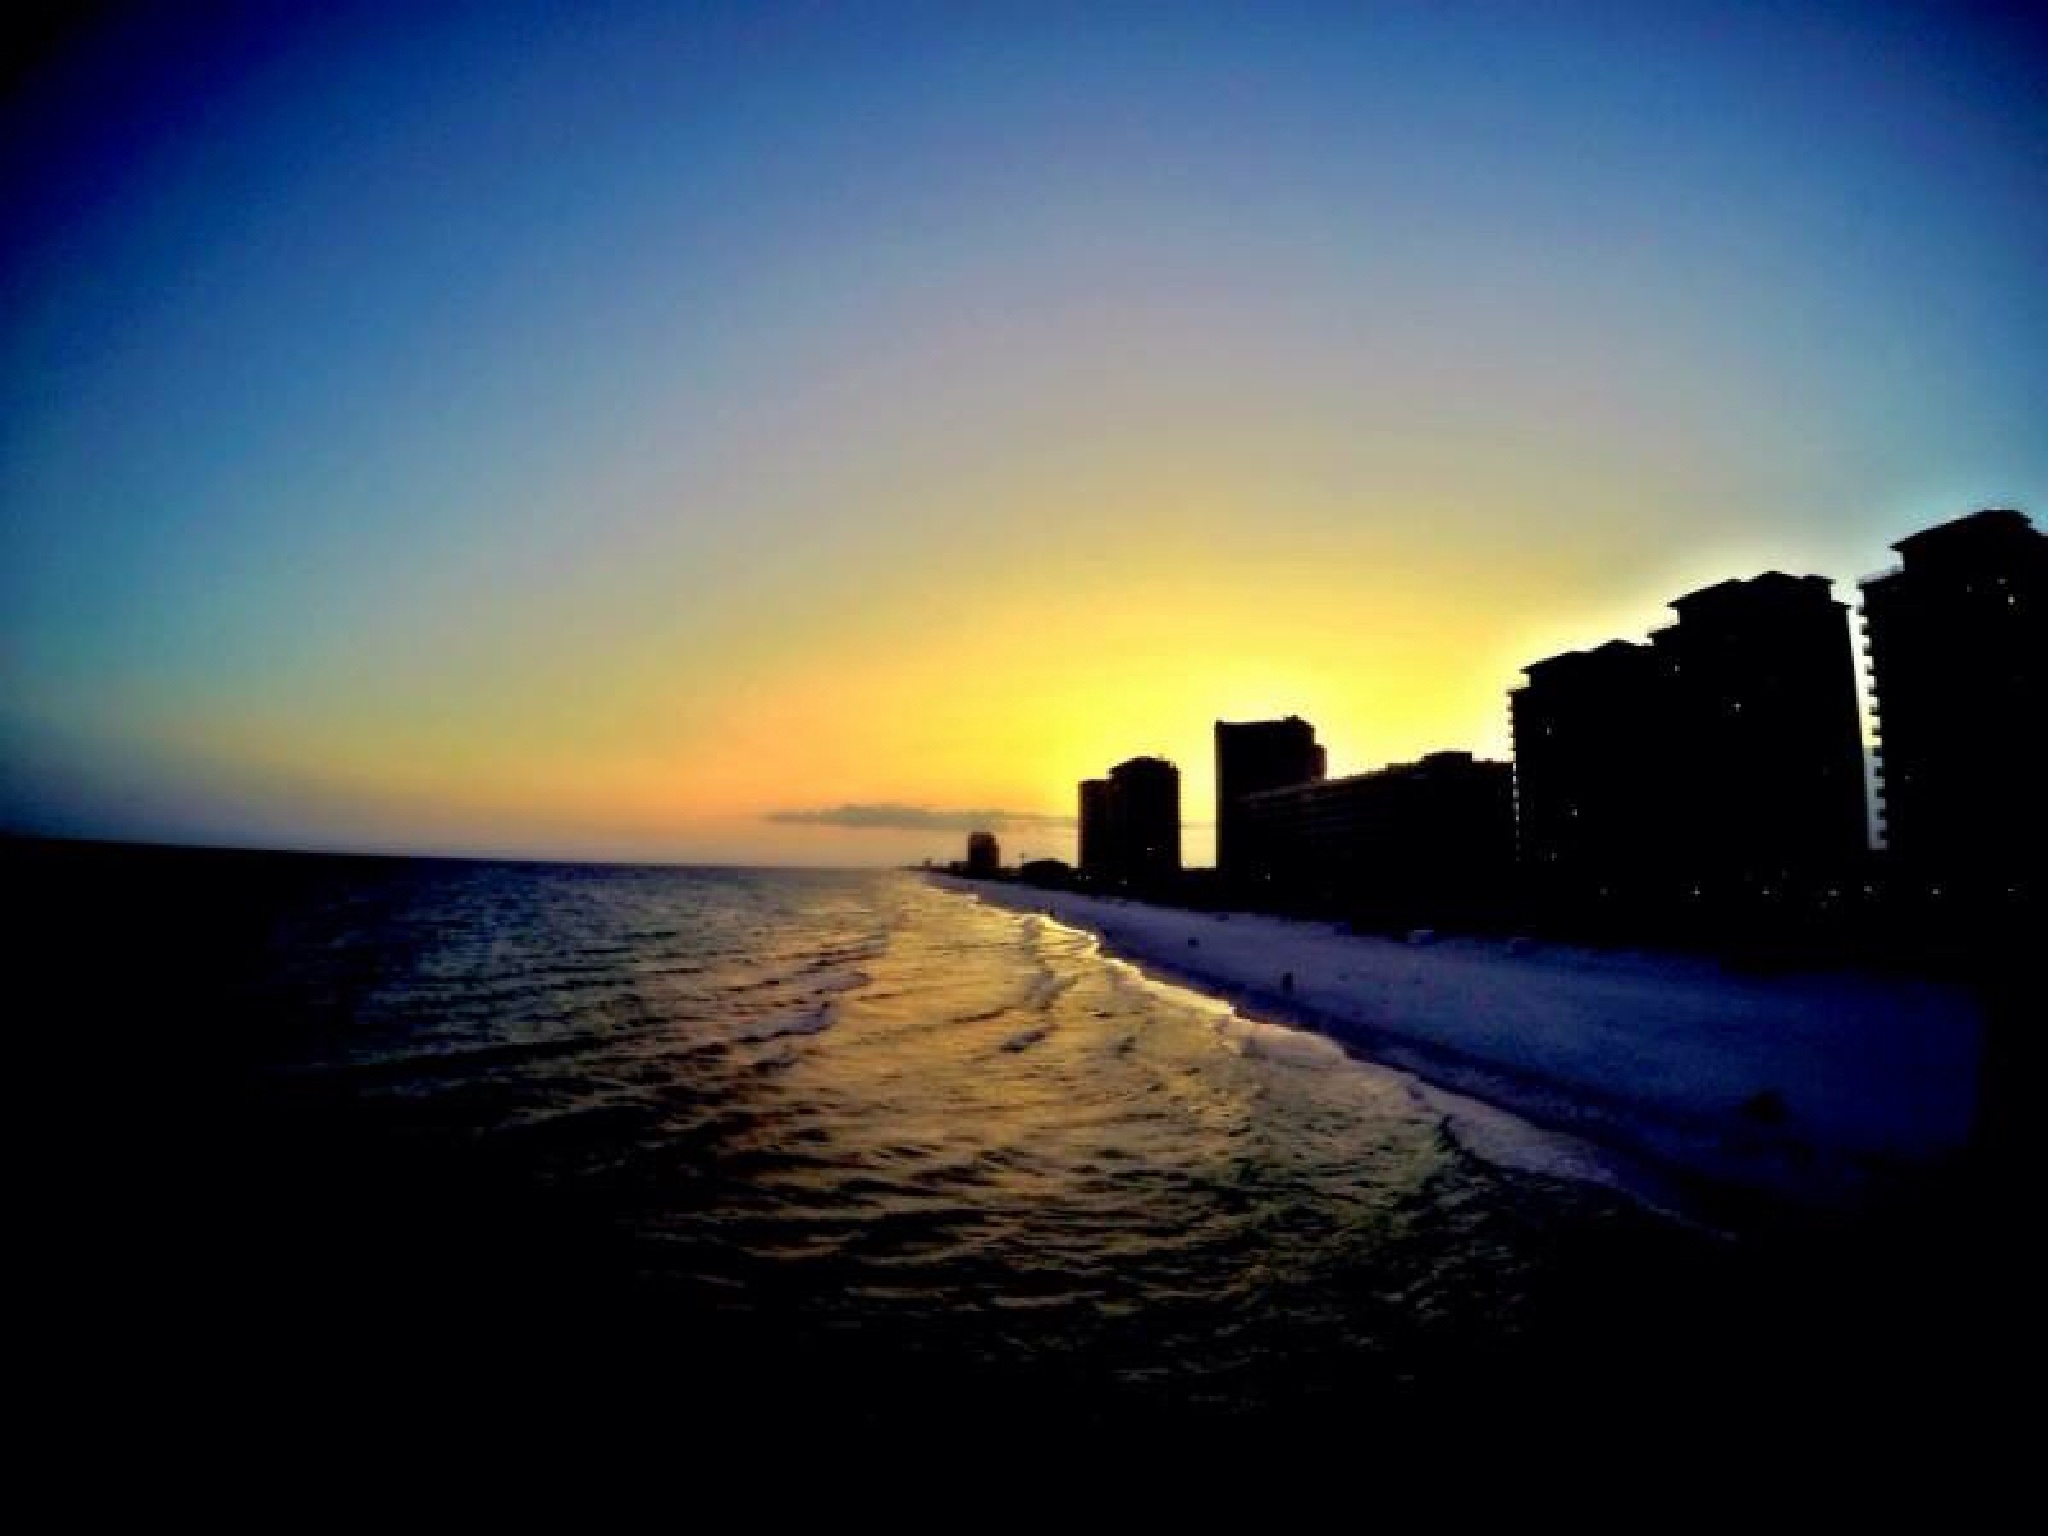 Sunset Navarre beach Florida  by Lisa BluWolf Sahani